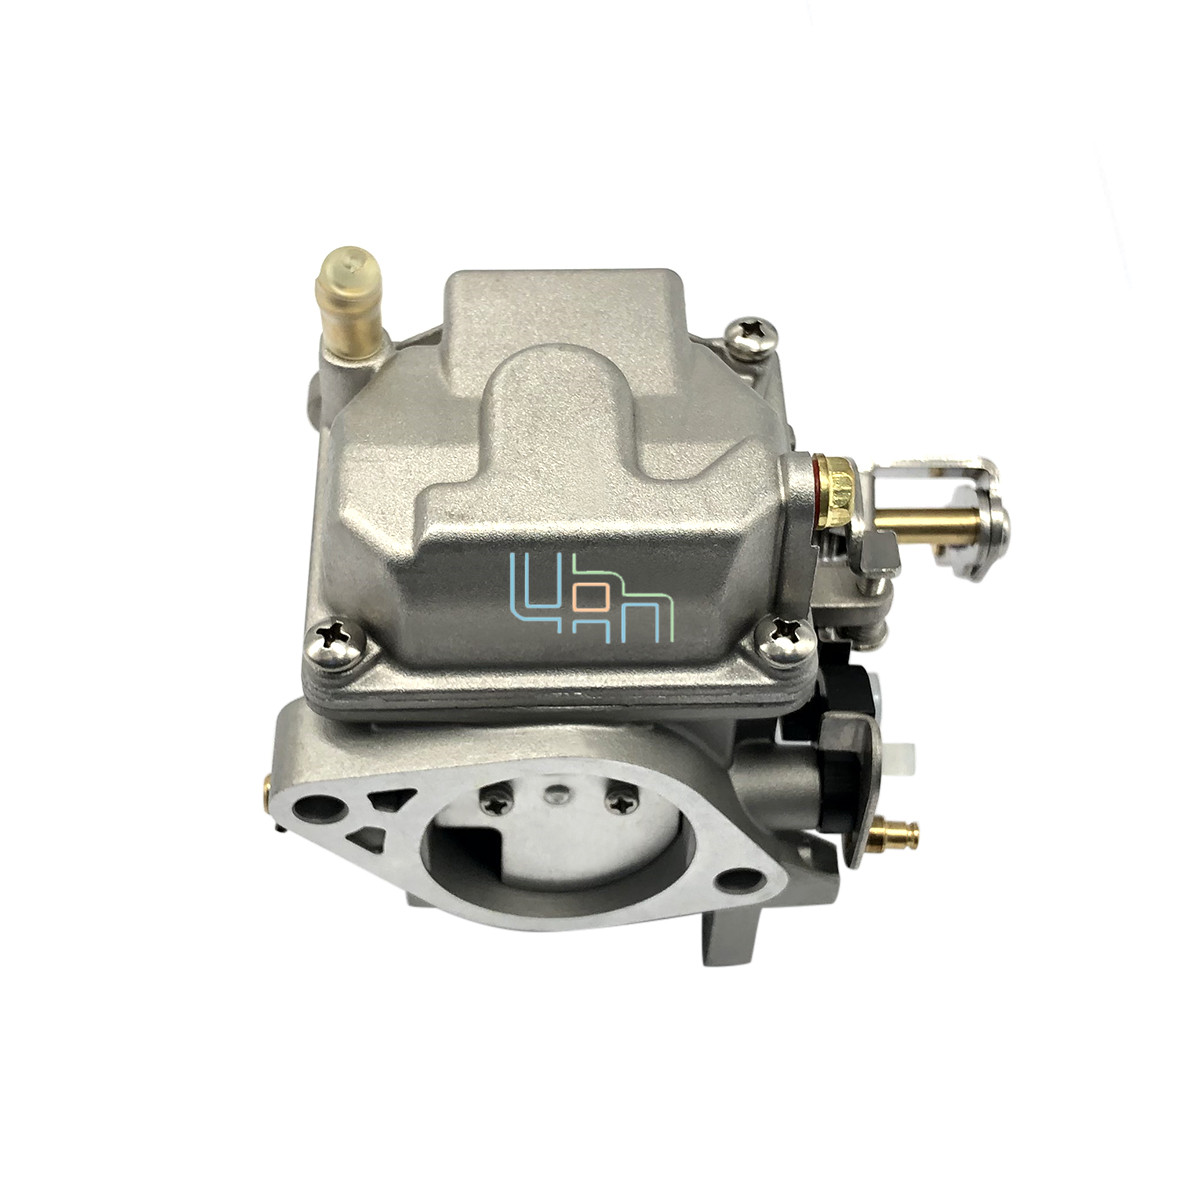 13200-91D21 13200-939D1 Carburetor For  Suzuki 15HP DT15 DT9.9